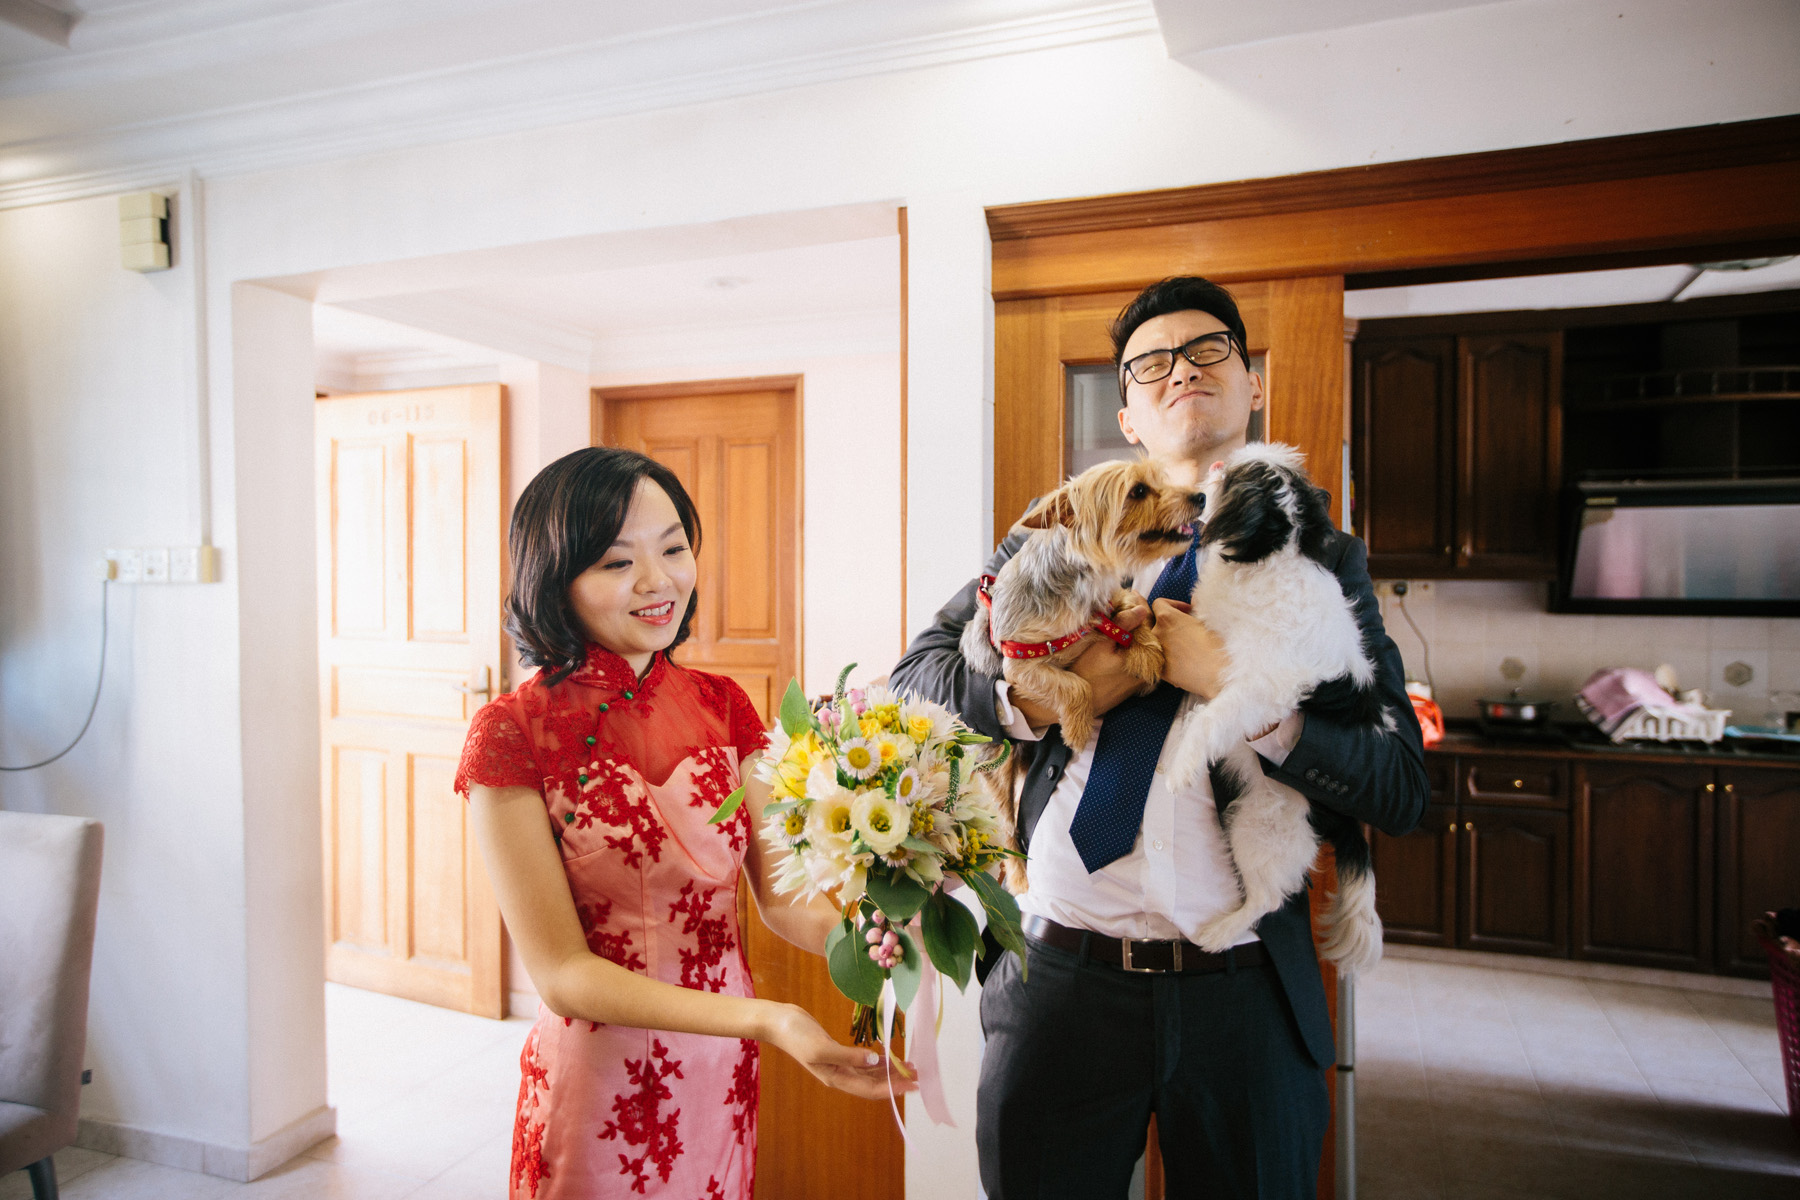 singapore-wedding-travel-photographer-faith-alvin-wedding-wmt-12.jpg